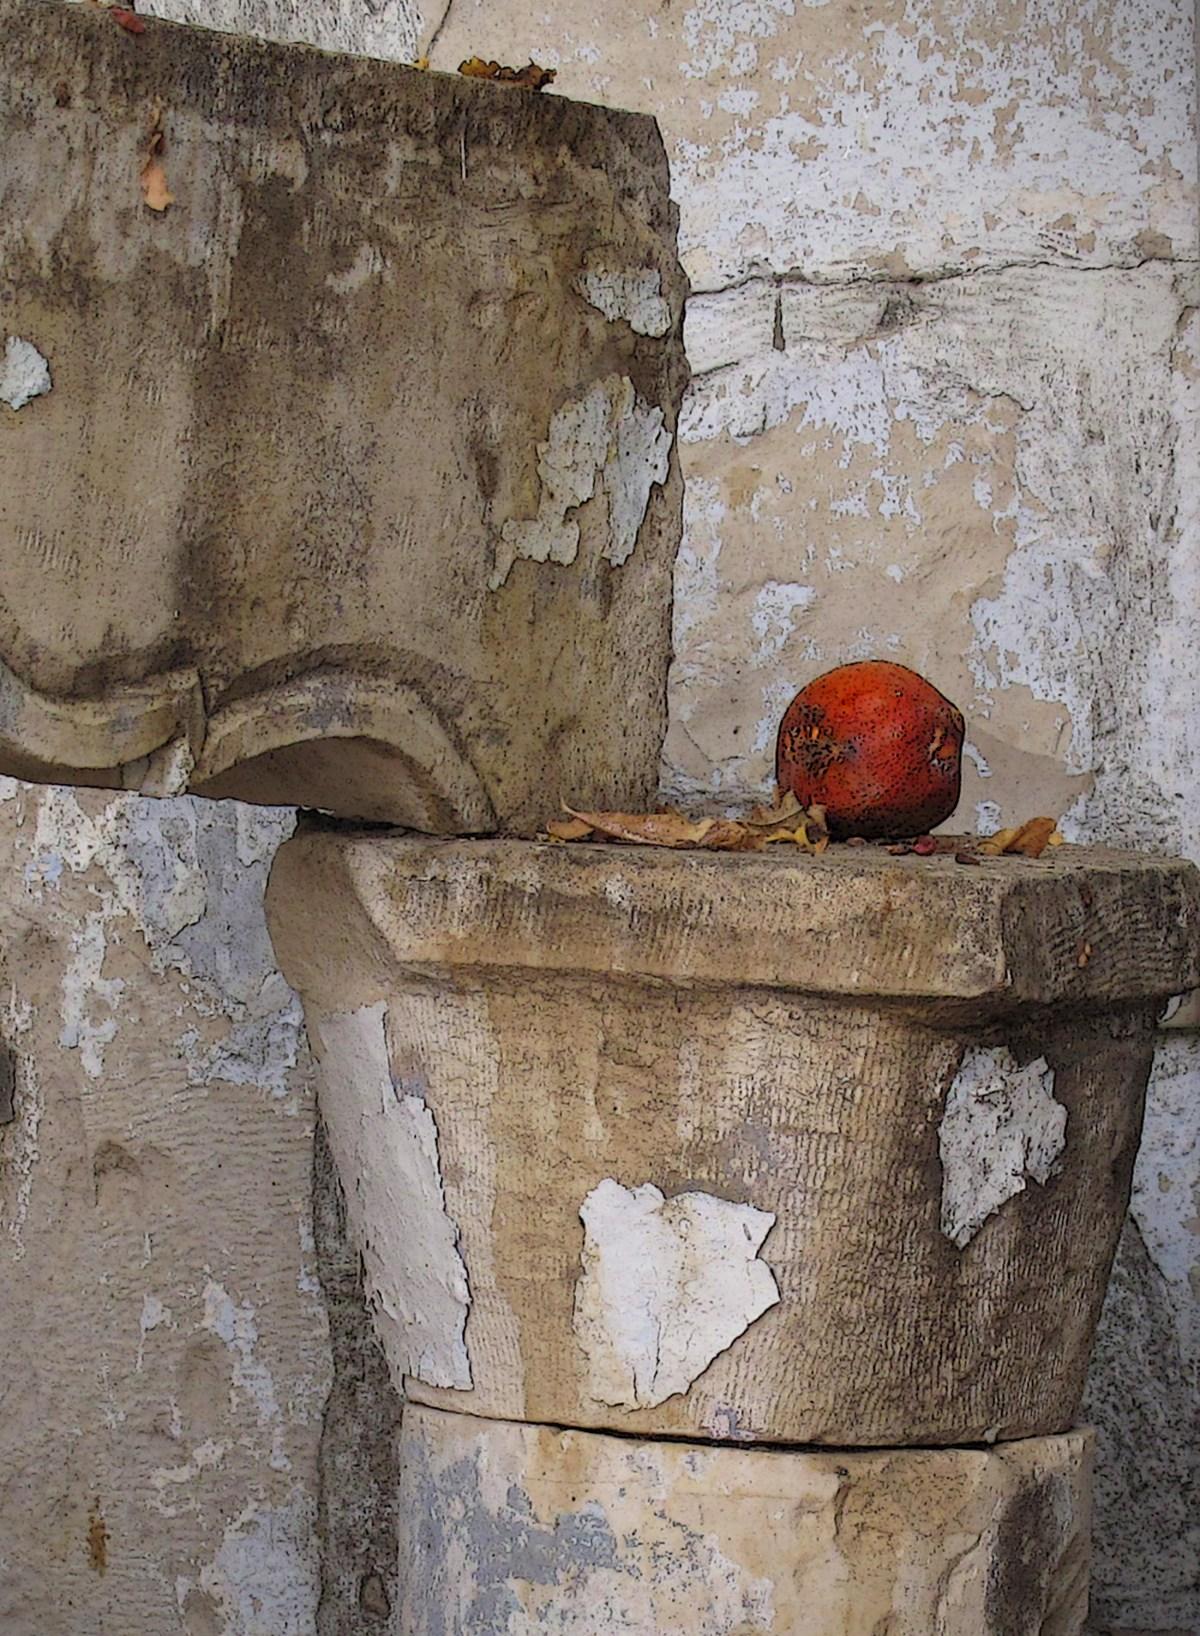 """Jerusalem Pomegranates"" by Sonia Melnikova-Raich"